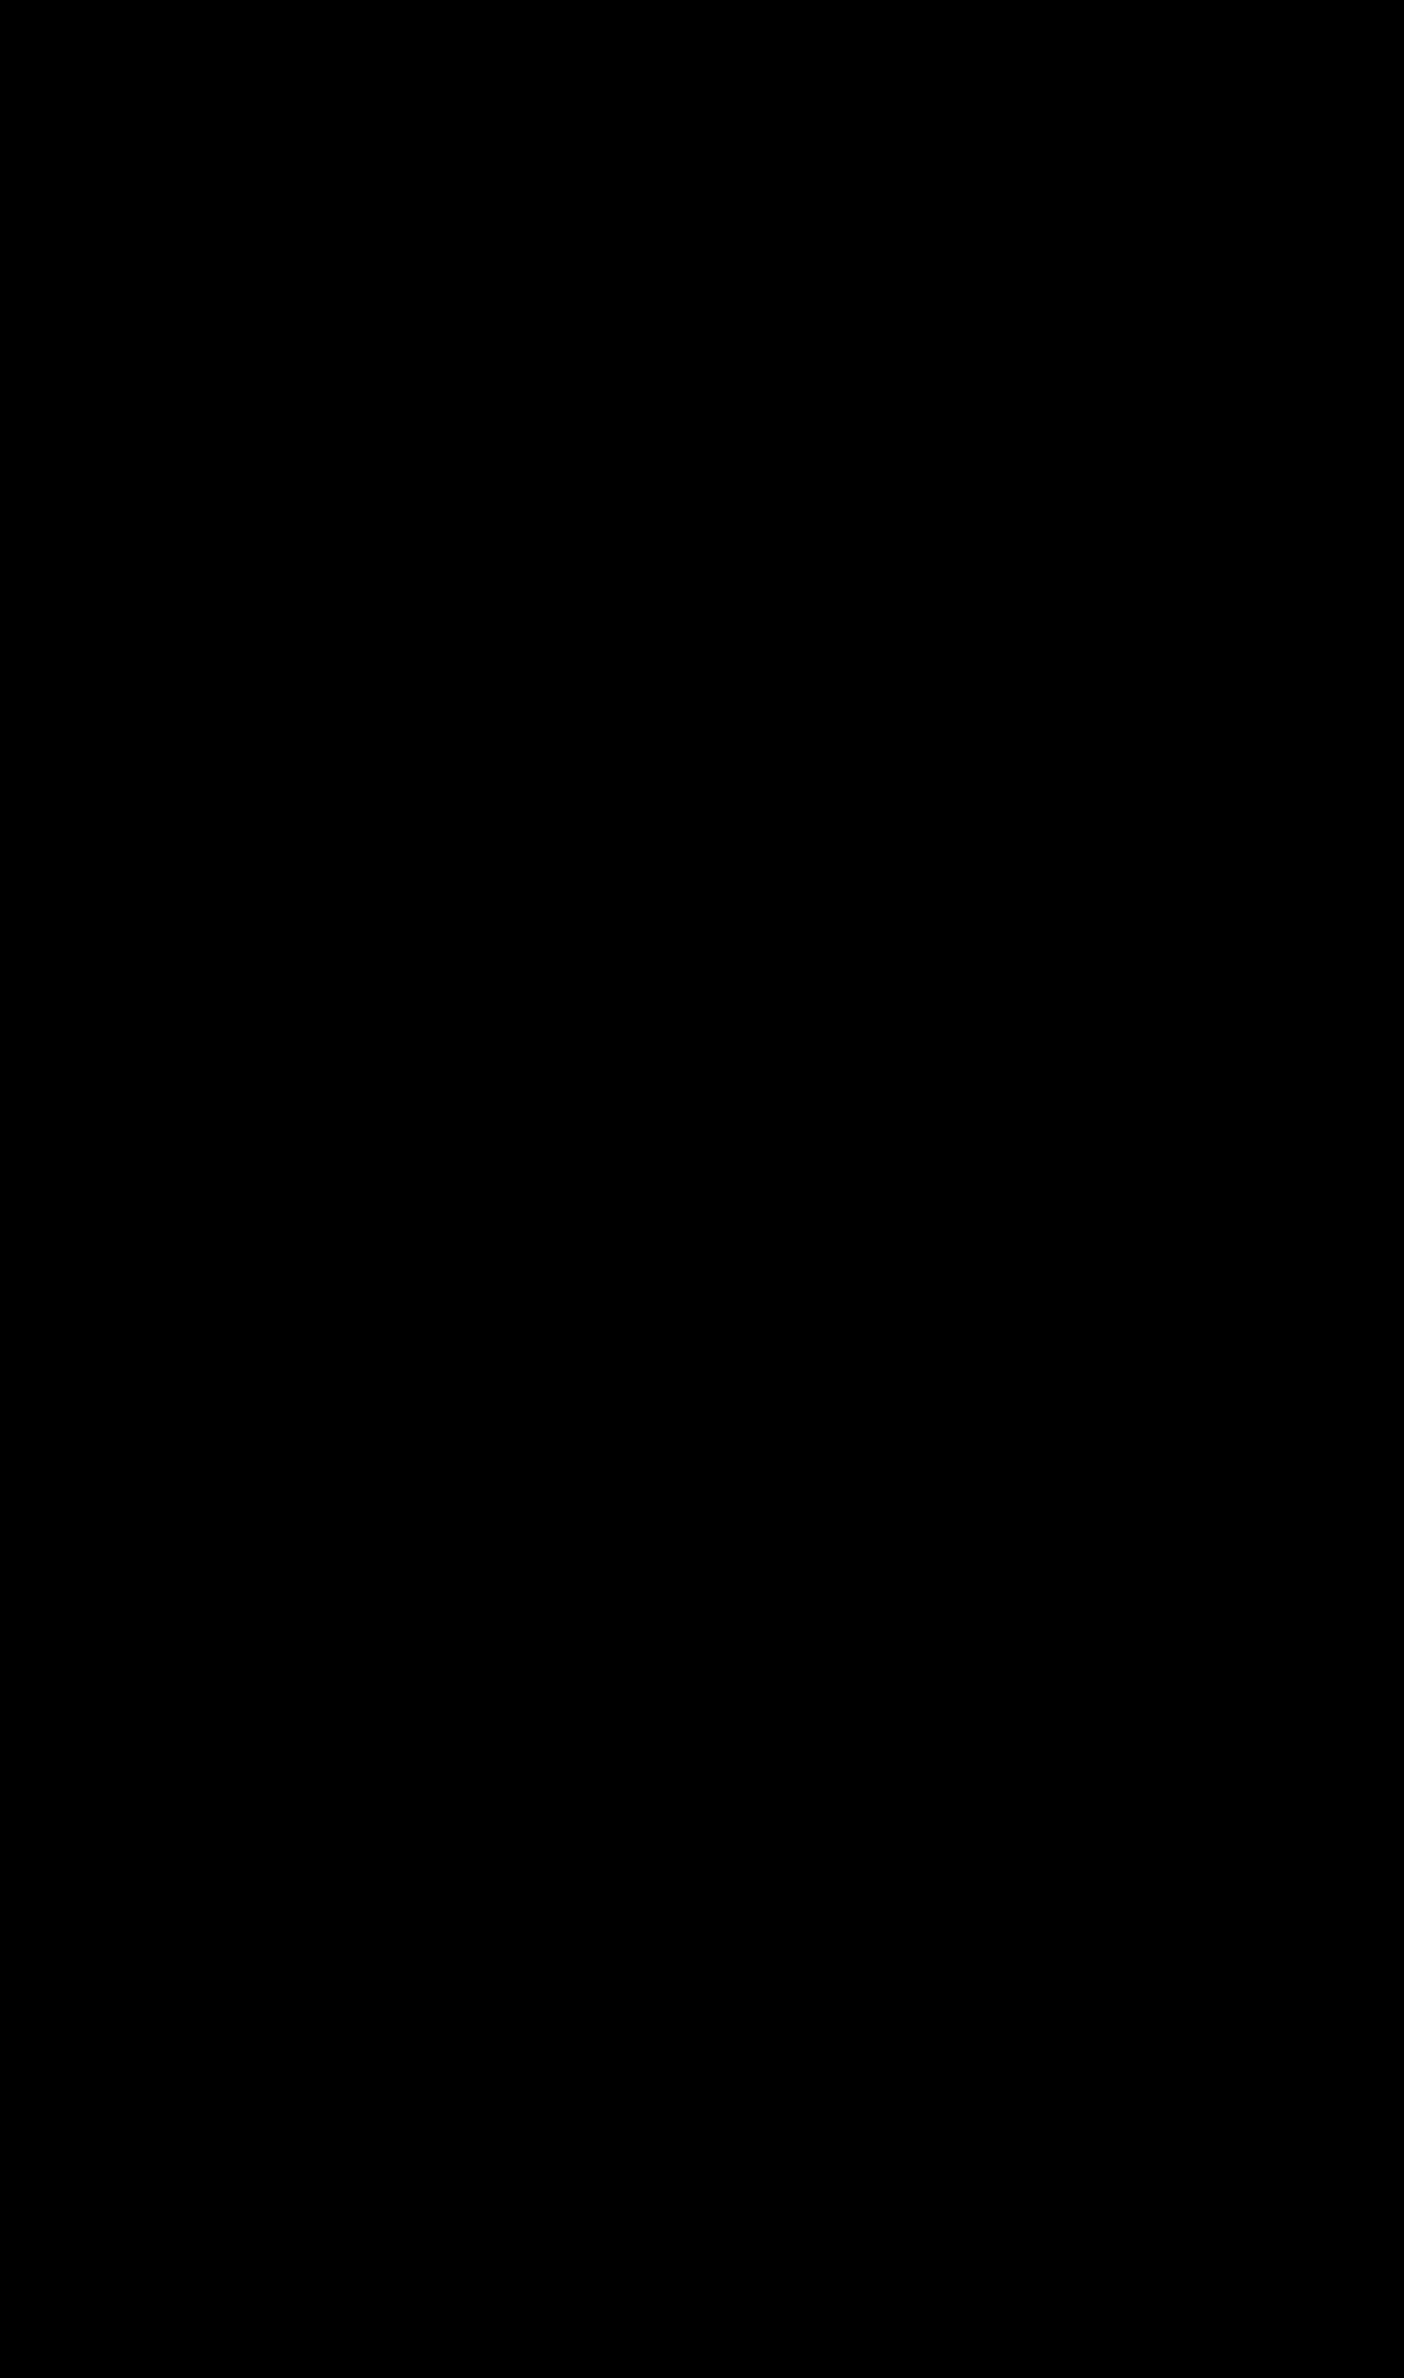 Simple shooting big image. Clipart star meteor